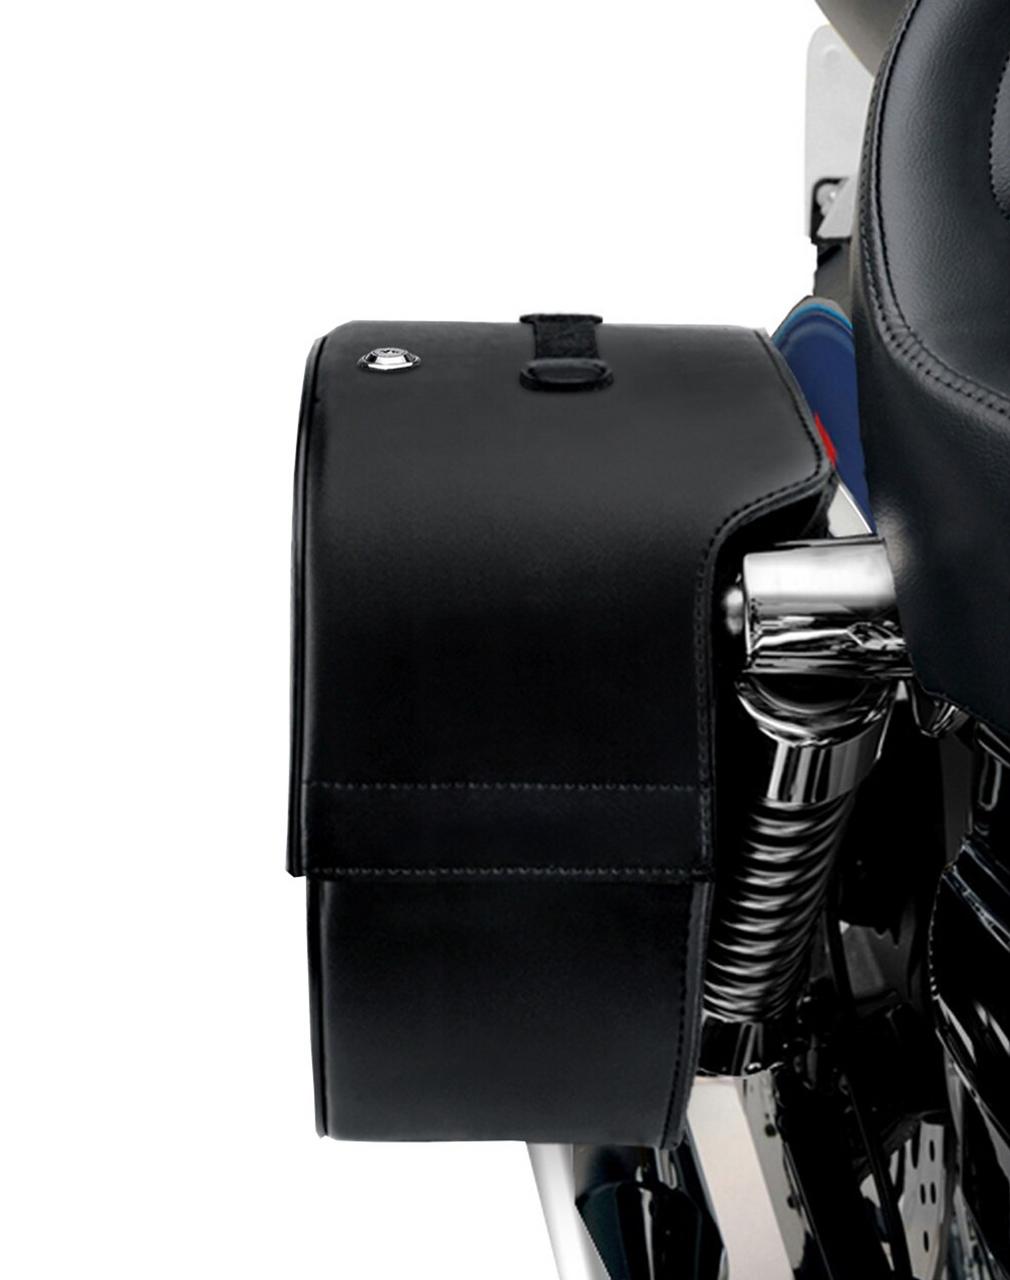 Triumph Thunderbird Viking Armor Shock Cutout Studded Motorcycle Saddlebags Shock Cutout View